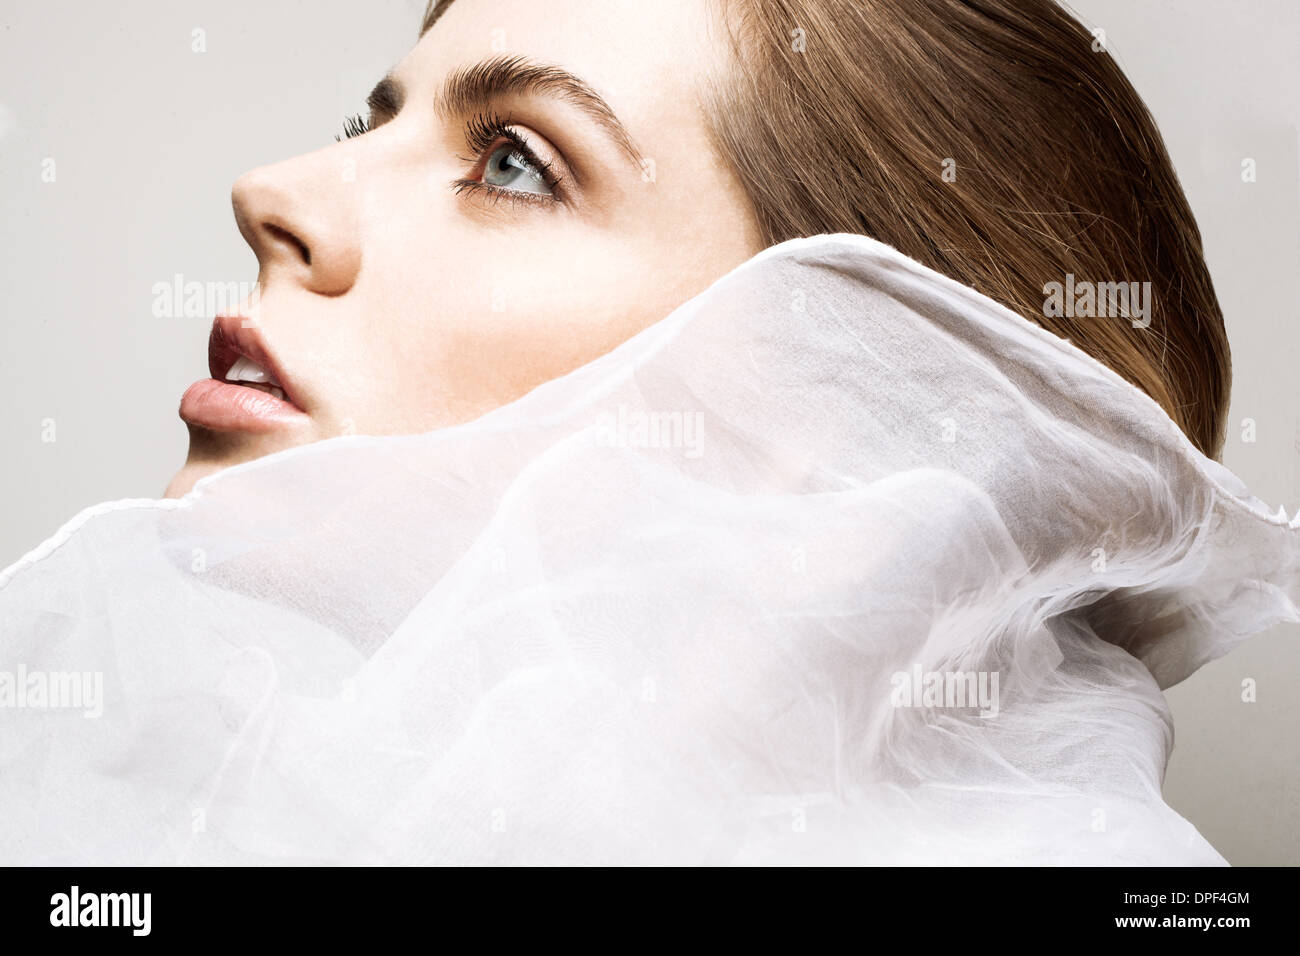 Profil von junge Frau Stockbild